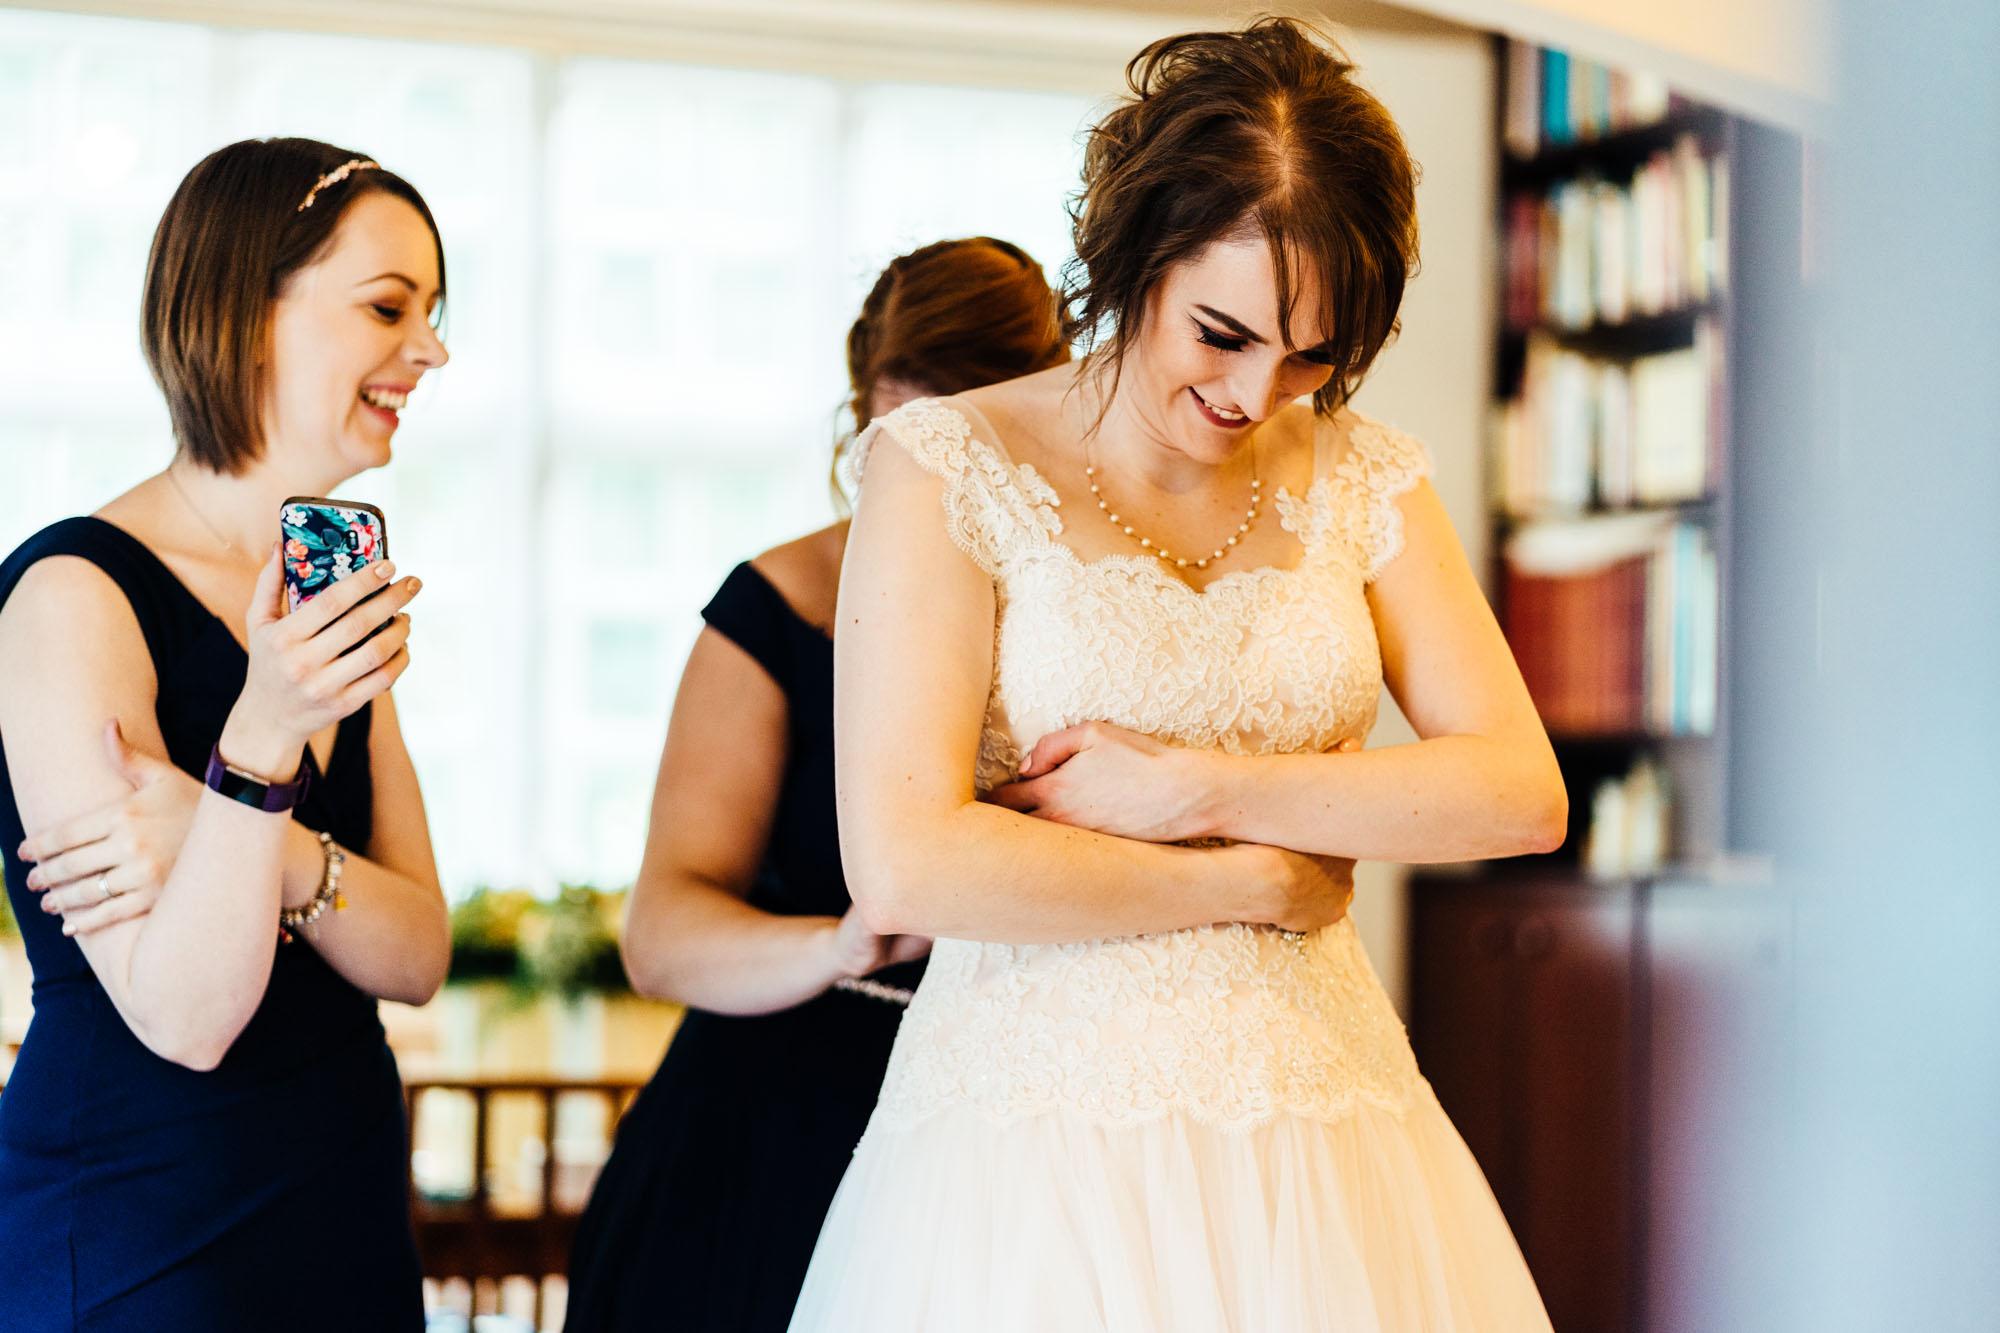 wedding-at-dodford-manor-12